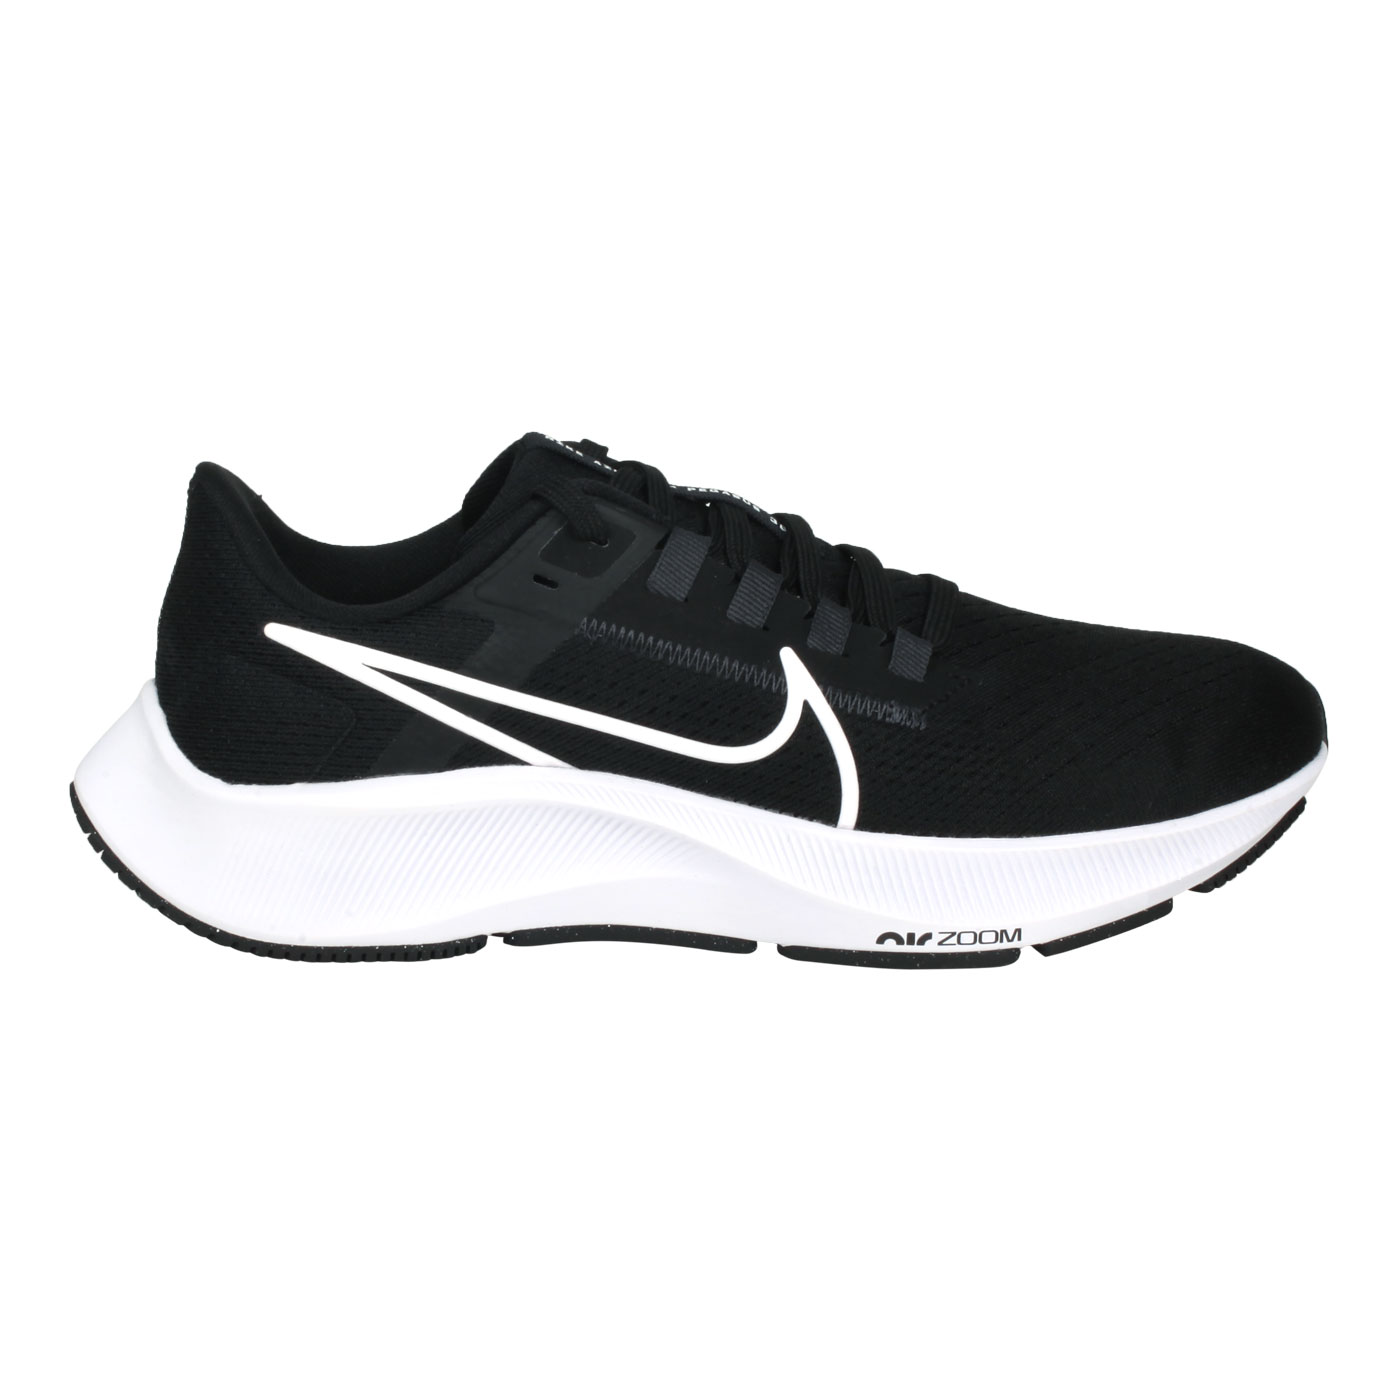 NIKE 女款慢跑鞋  @WMNS AIR ZOOM PEGASUS 38@CW7358002 - 黑白